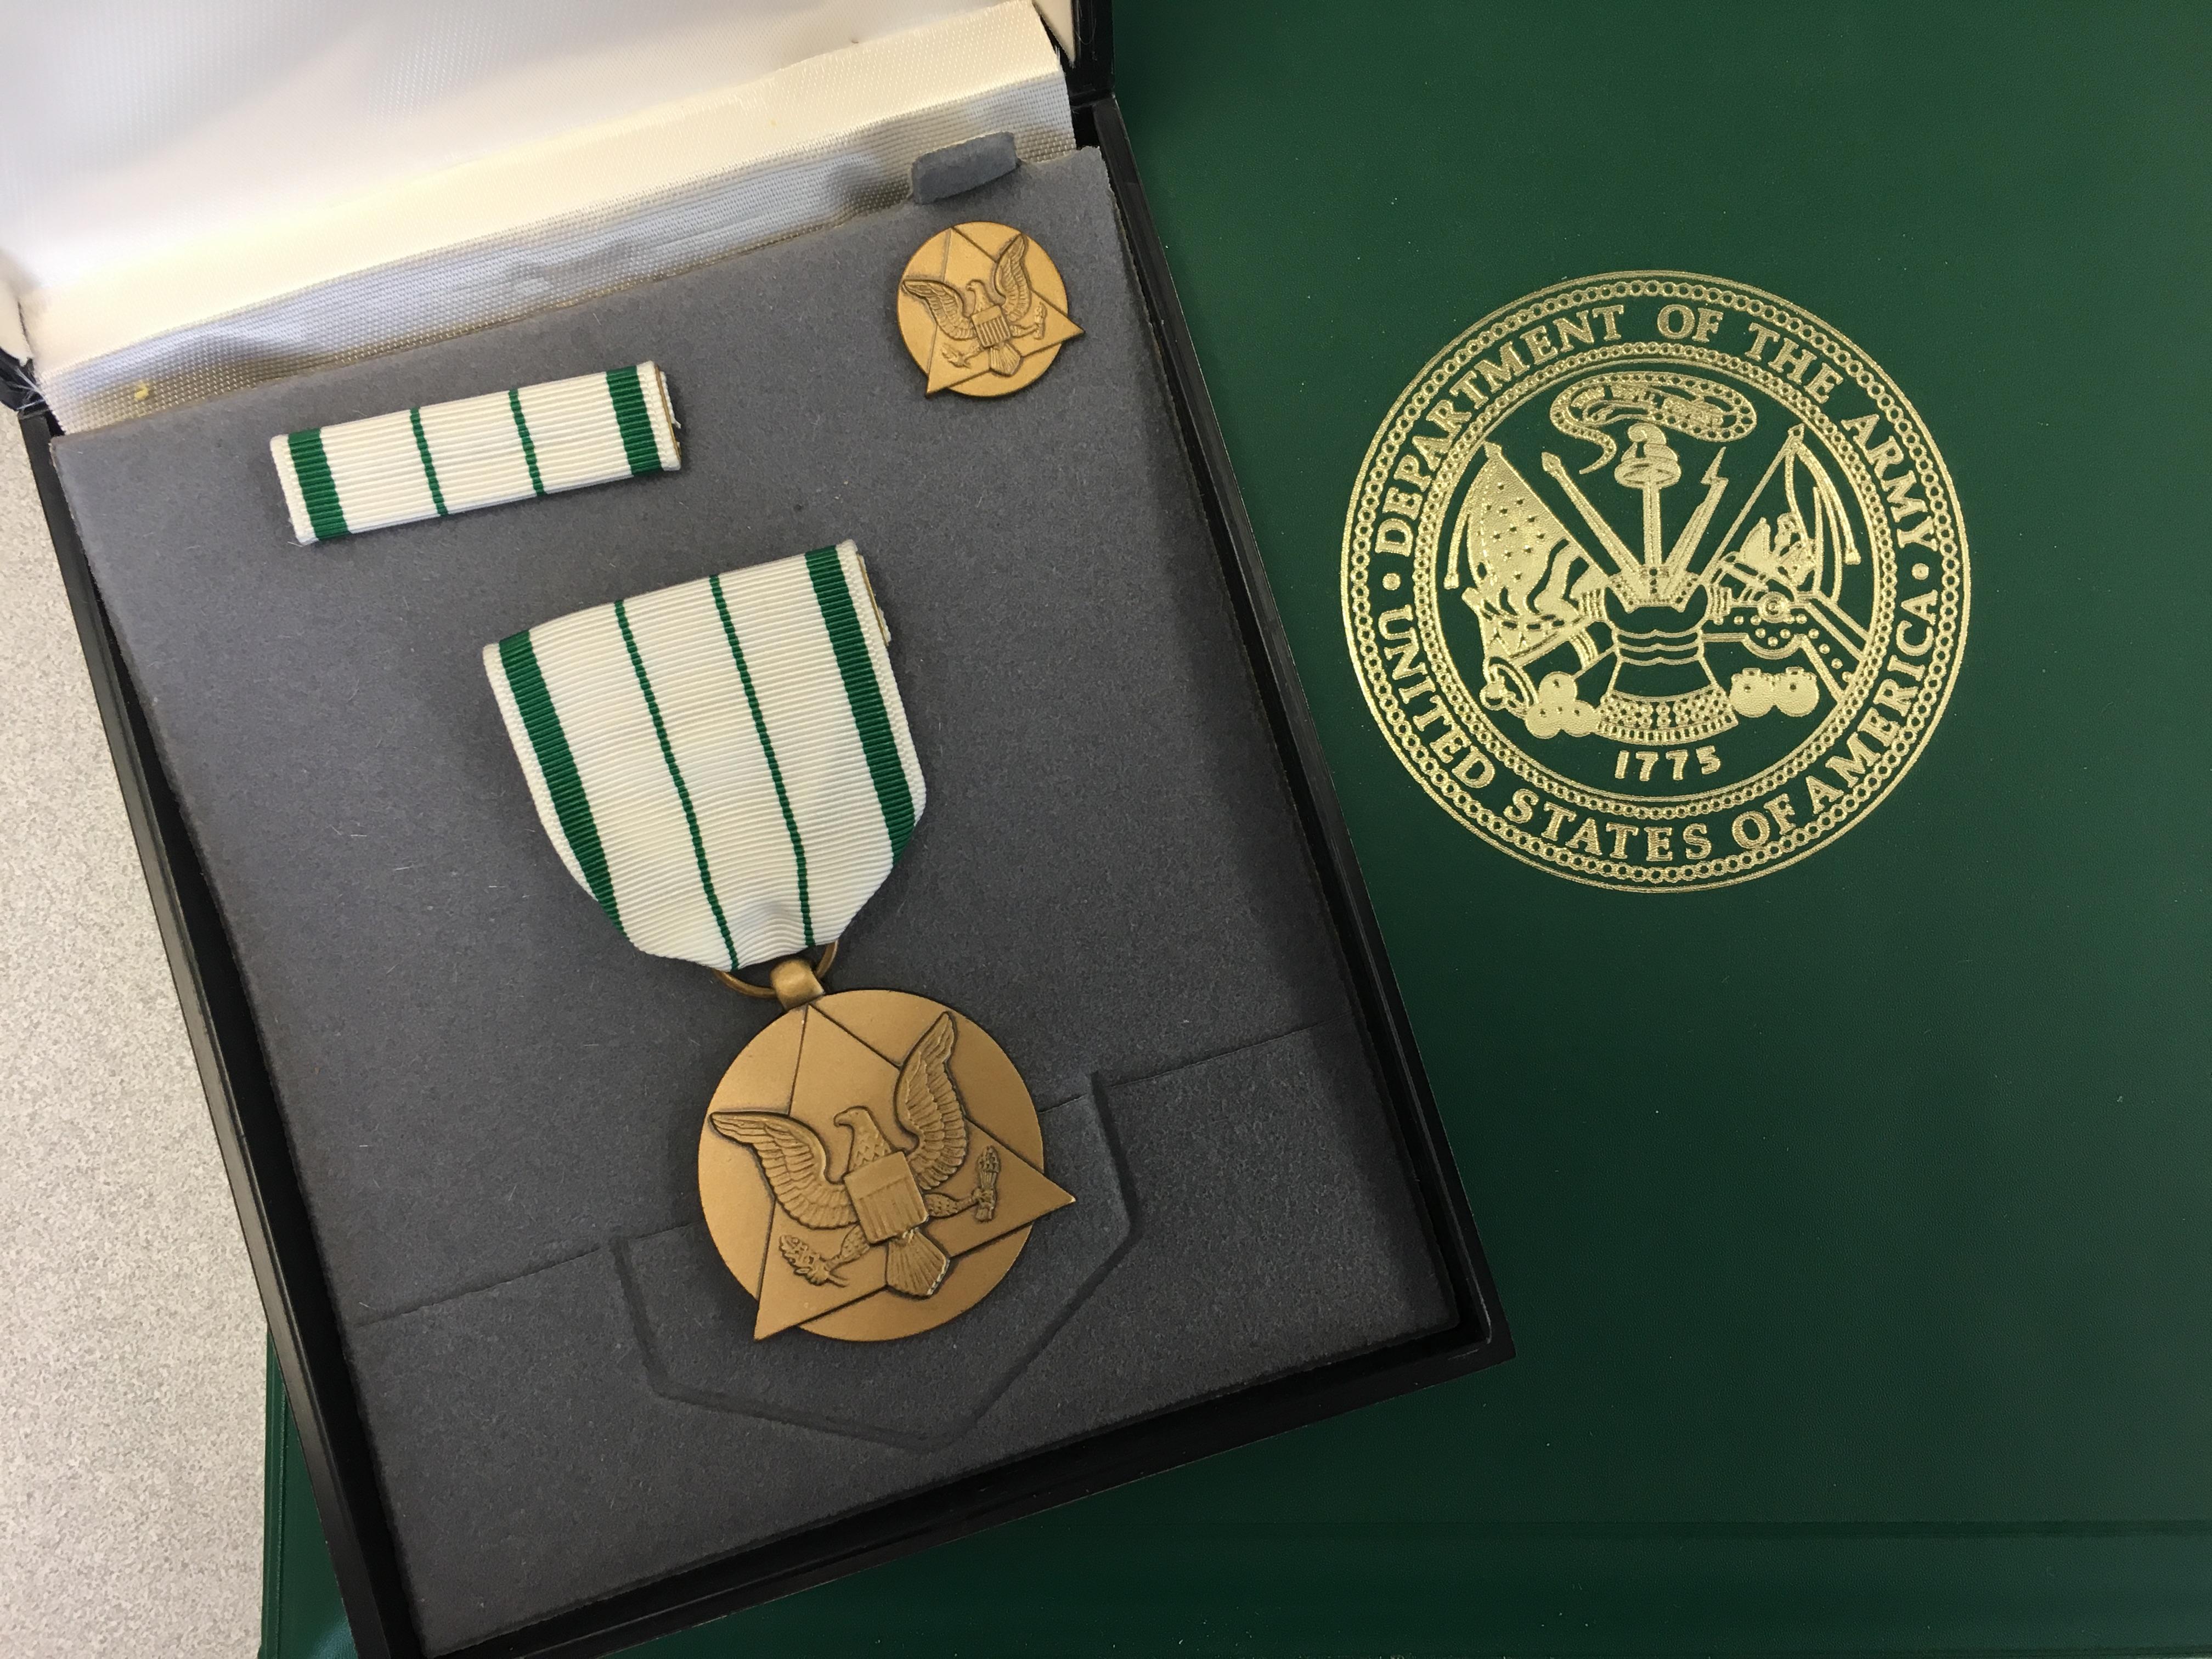 Victor Matthews Receives Commander's Award for Public Service